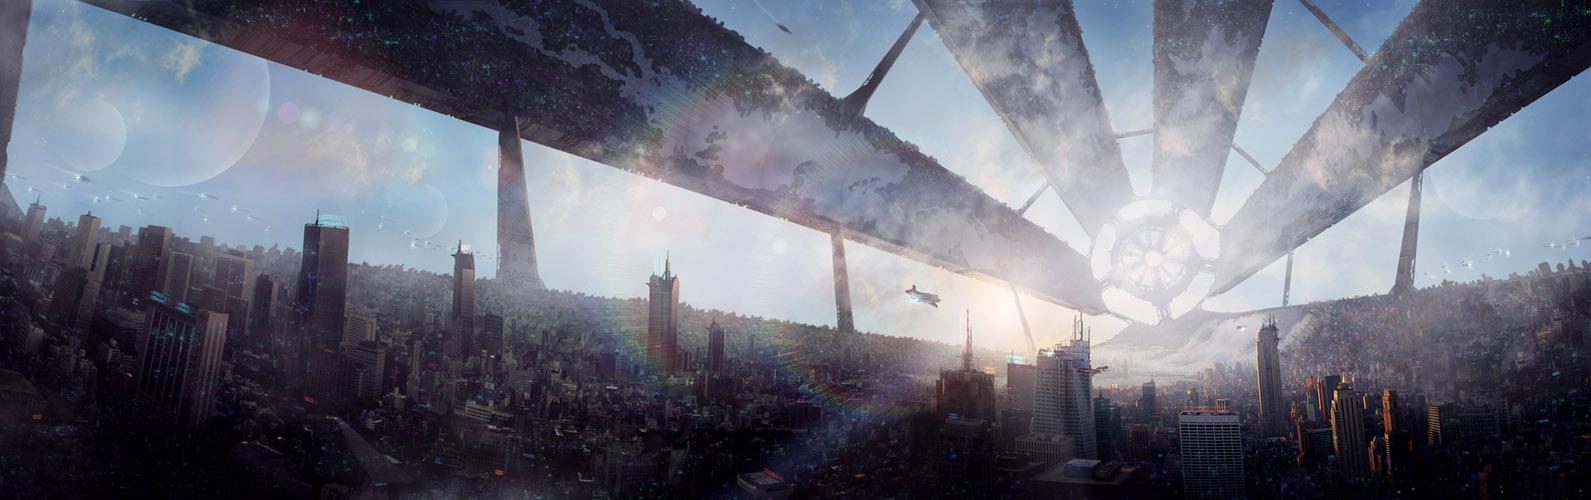 Oneill Cylander by TheArtofSaul